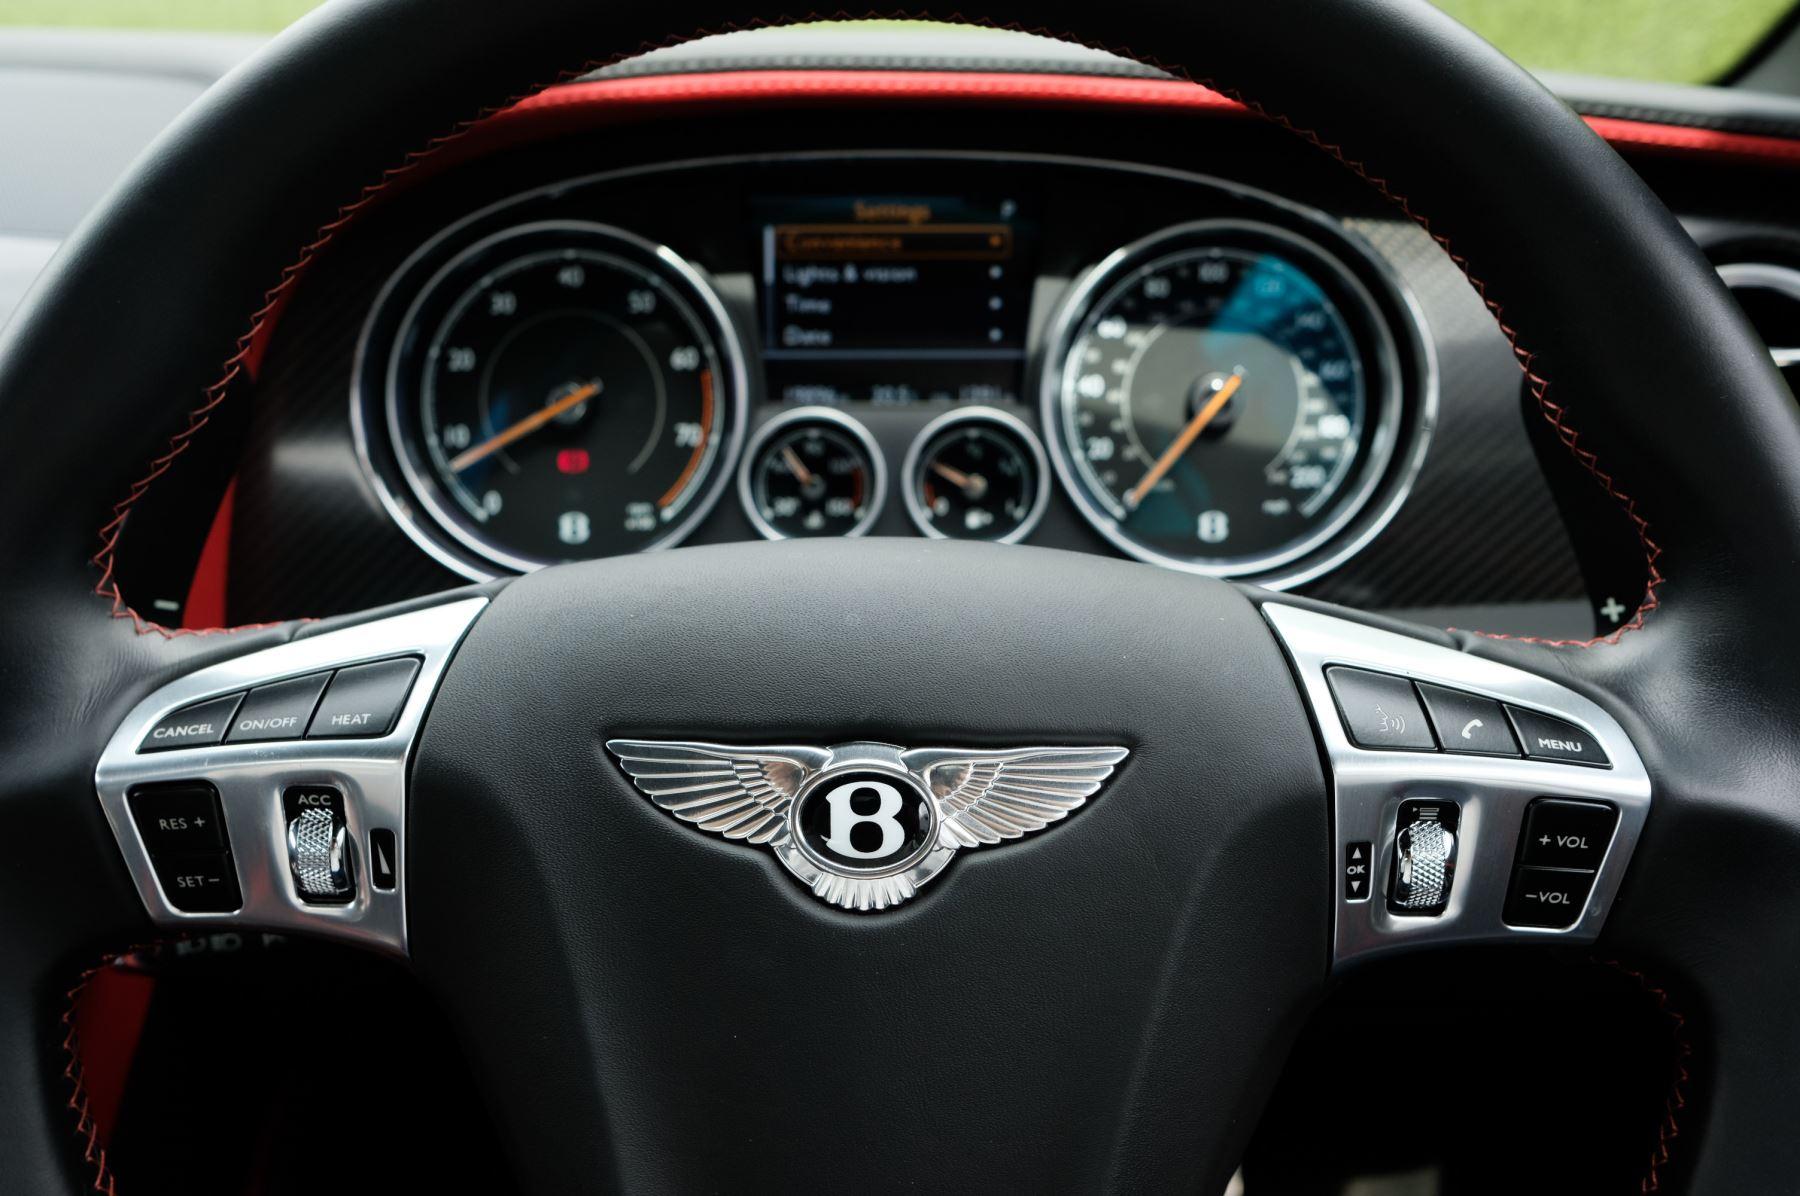 Bentley Continental GT 6.0 W12 [635] Speed - Premier Specification - Carbon Fibre Fascia Panels image 15